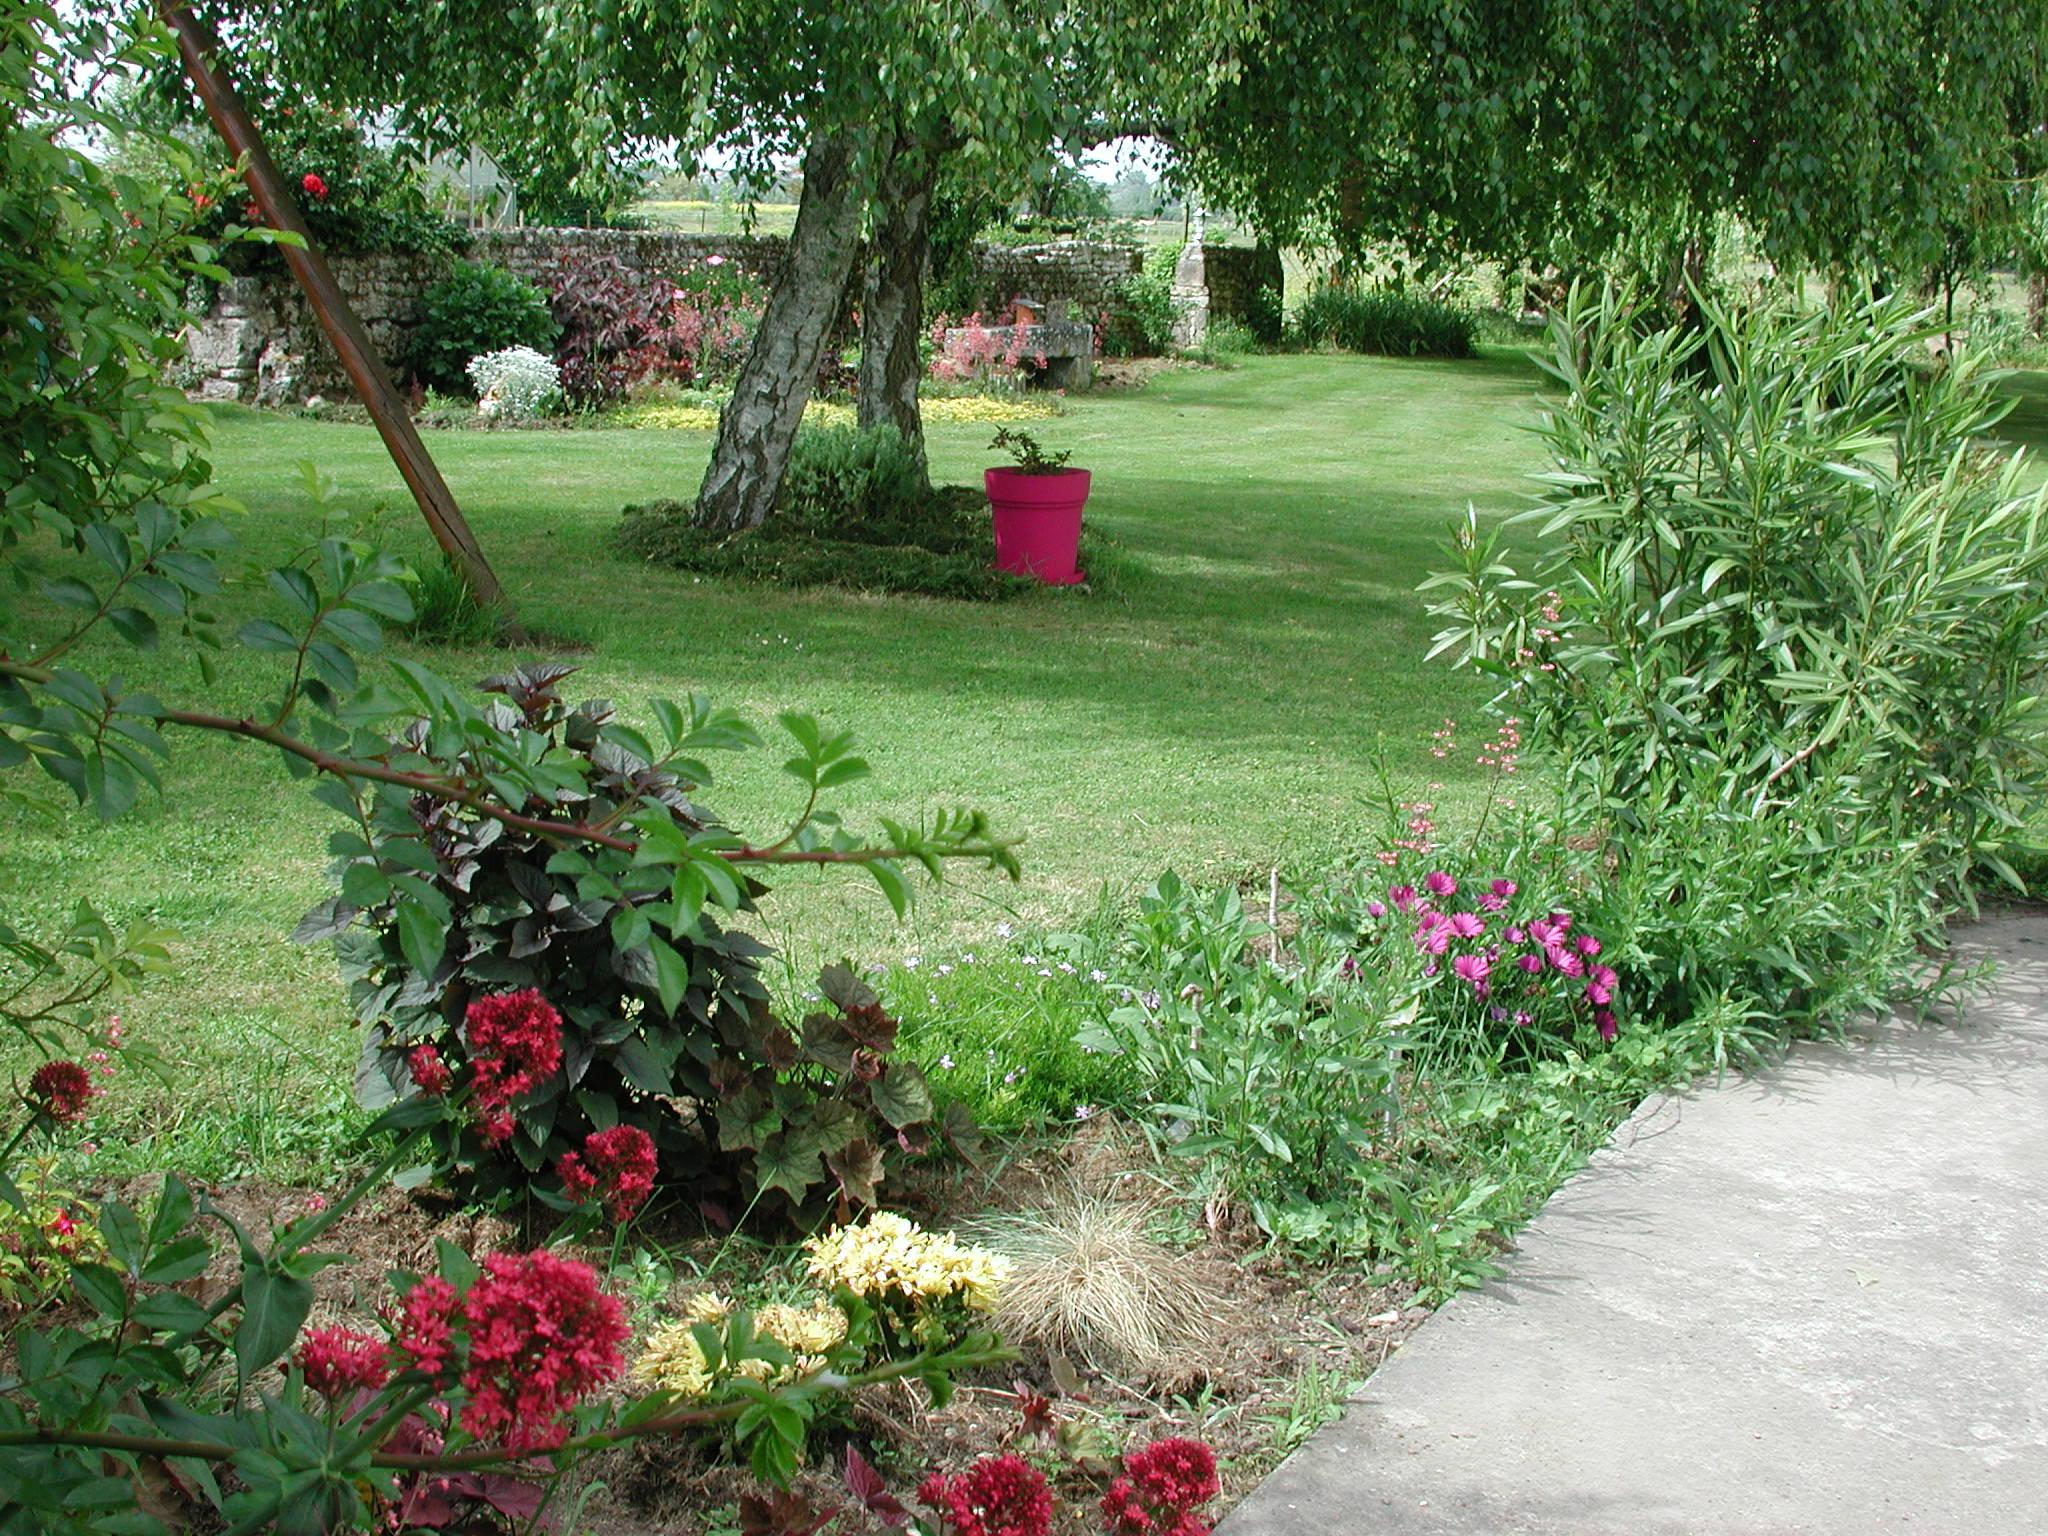 le printemps arrive page 25 au jardin forum de jardinage. Black Bedroom Furniture Sets. Home Design Ideas